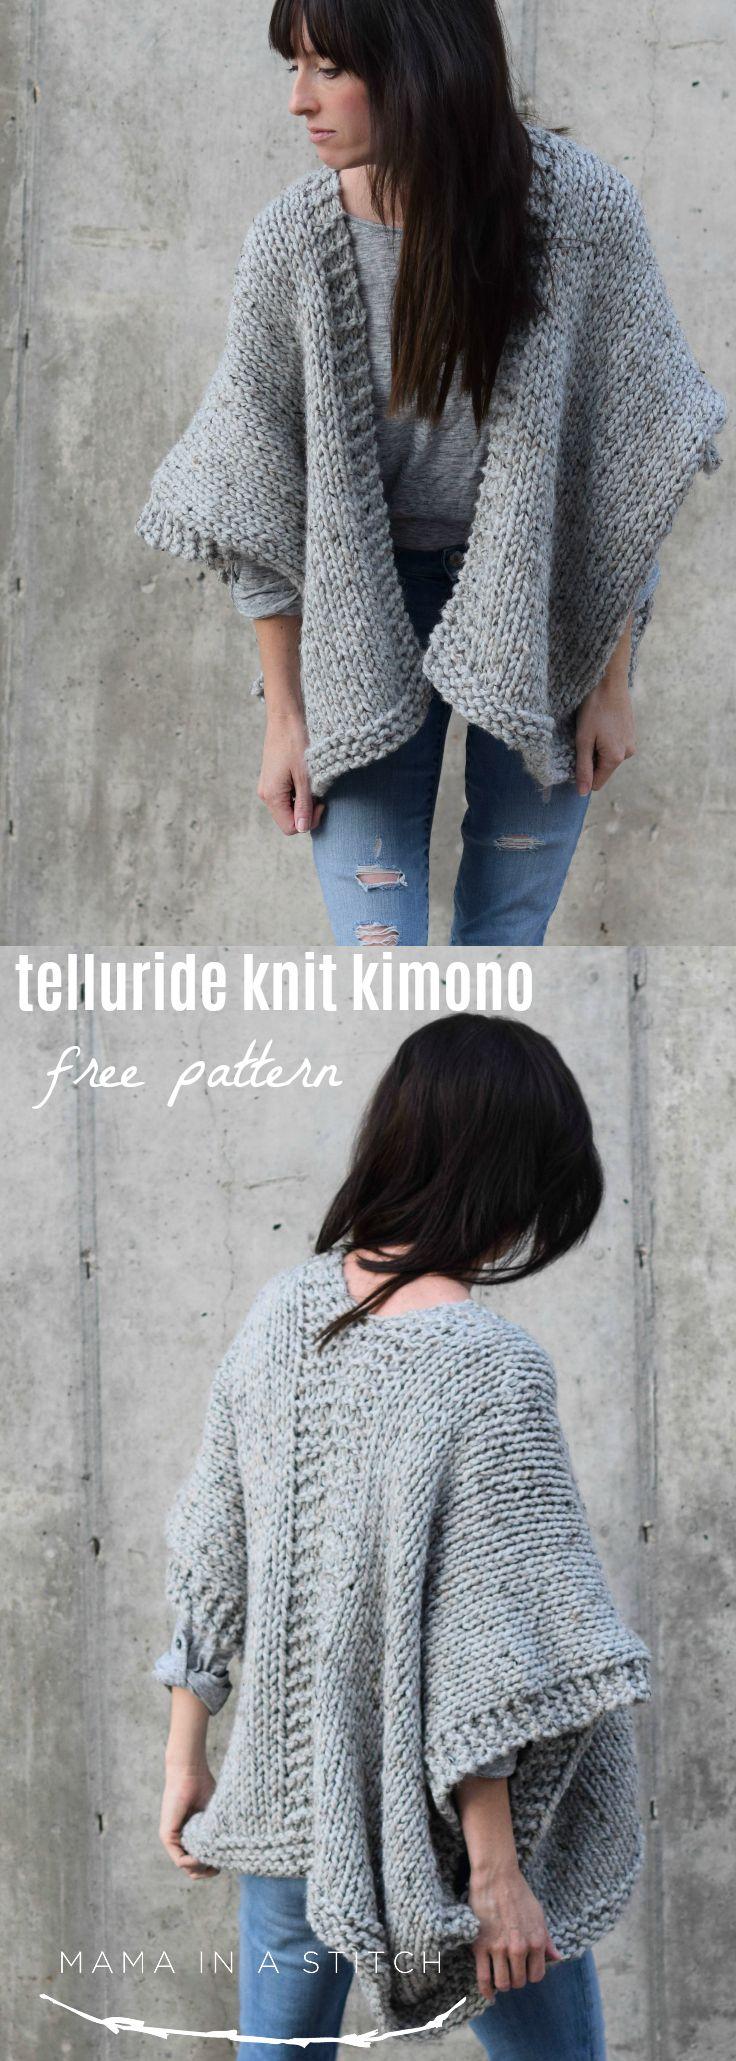 Telluride Easy Knit Kimono Pattern | Ponchos, Tejido y Dos agujas